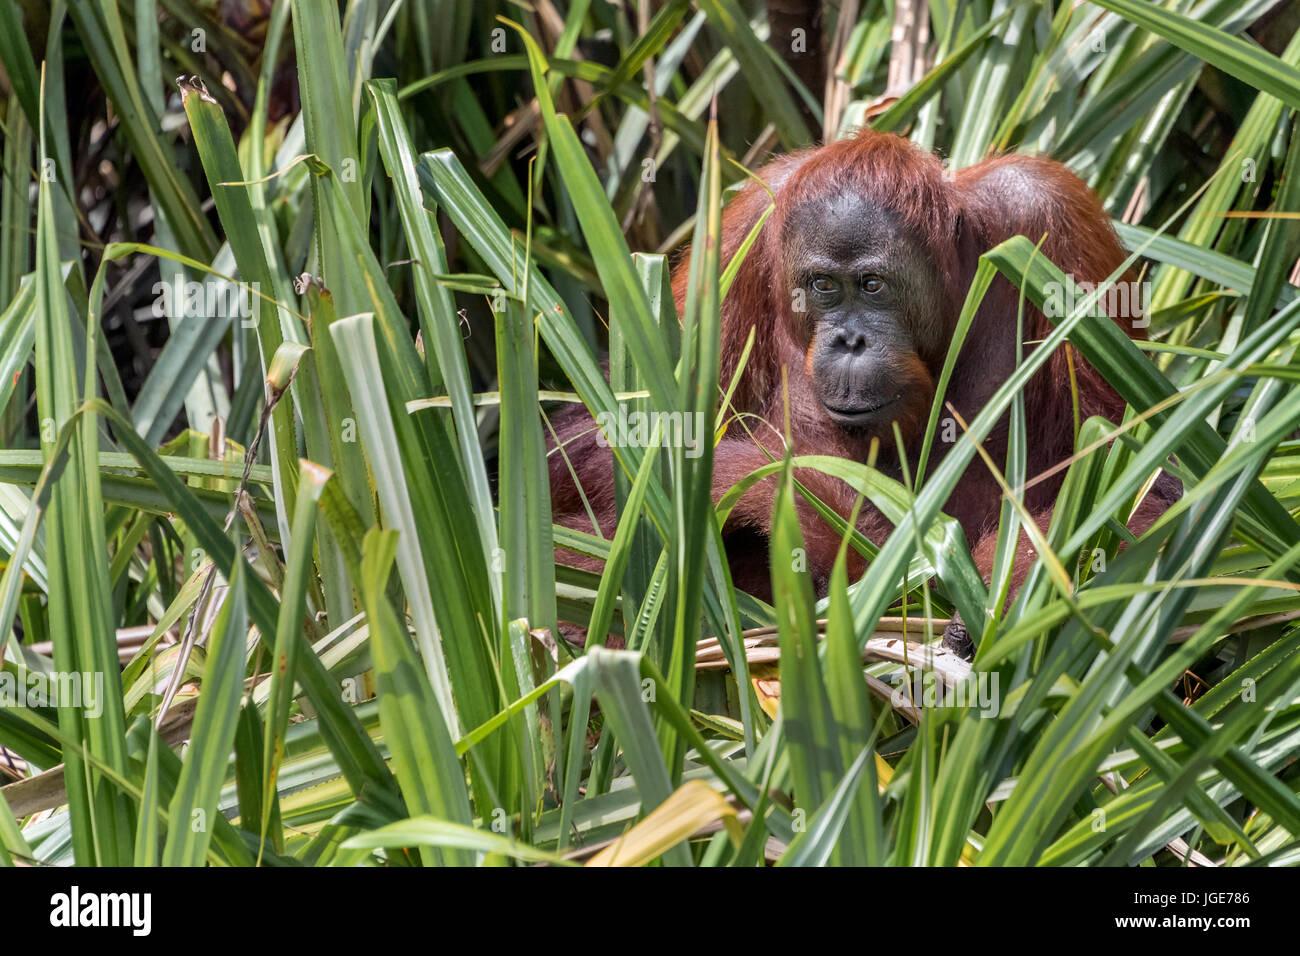 Orangutan in palmetto grass by the Sekonyer River, Kalimantan, Indonesia - Stock Image